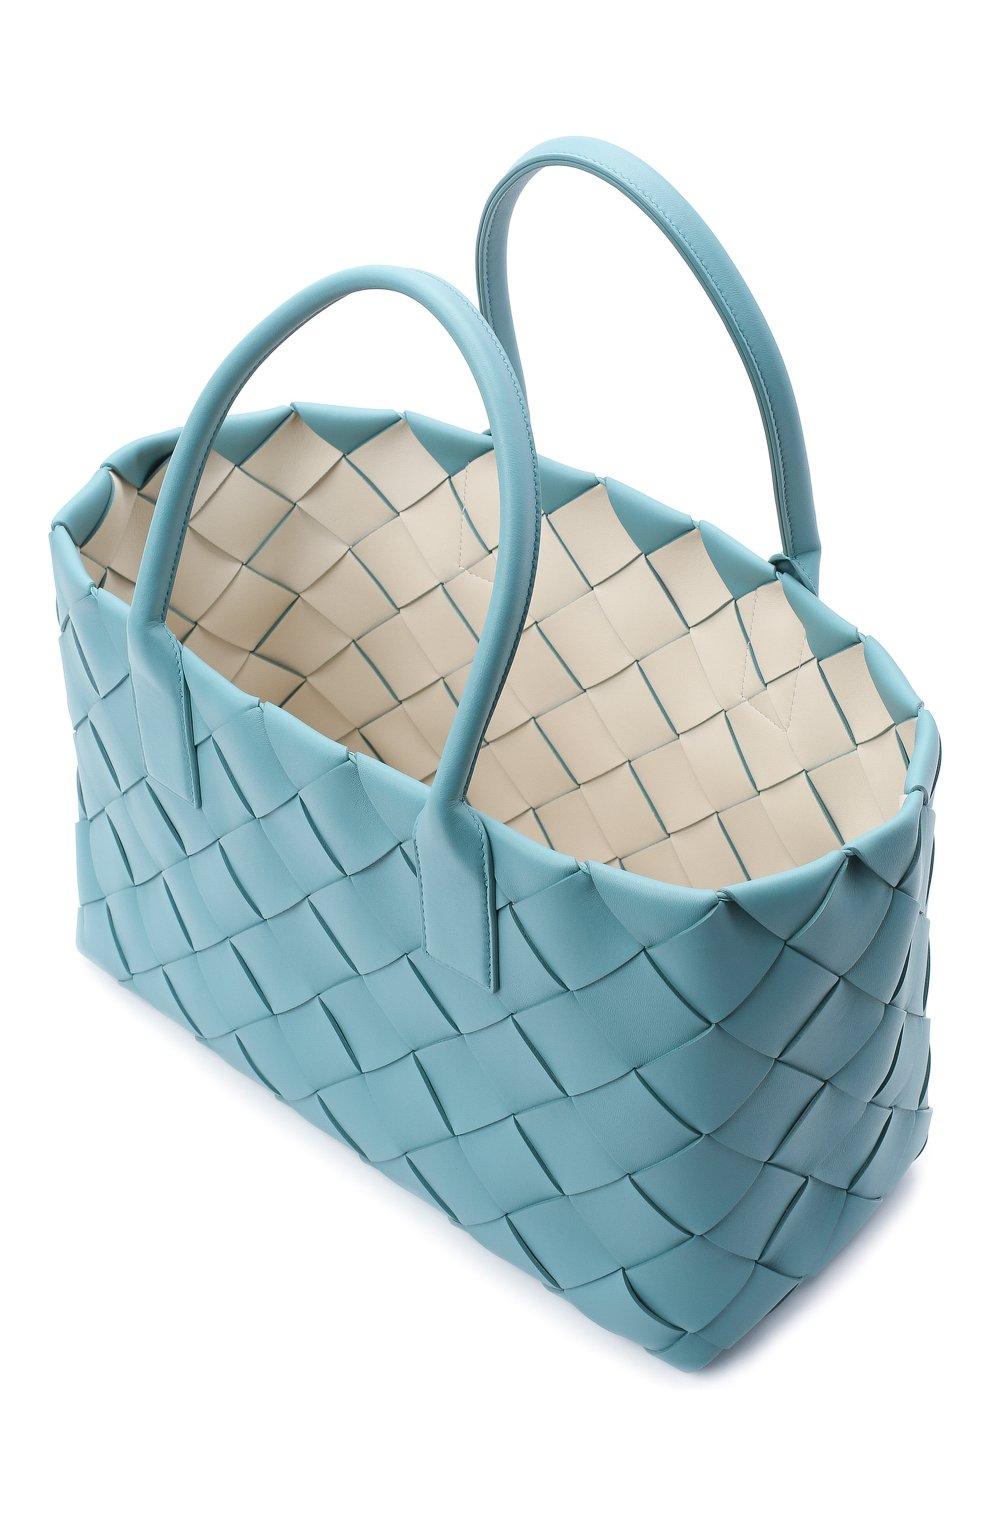 Женский сумка-тоут BOTTEGA VENETA голубого цвета, арт. 630817/VMAY3 | Фото 4